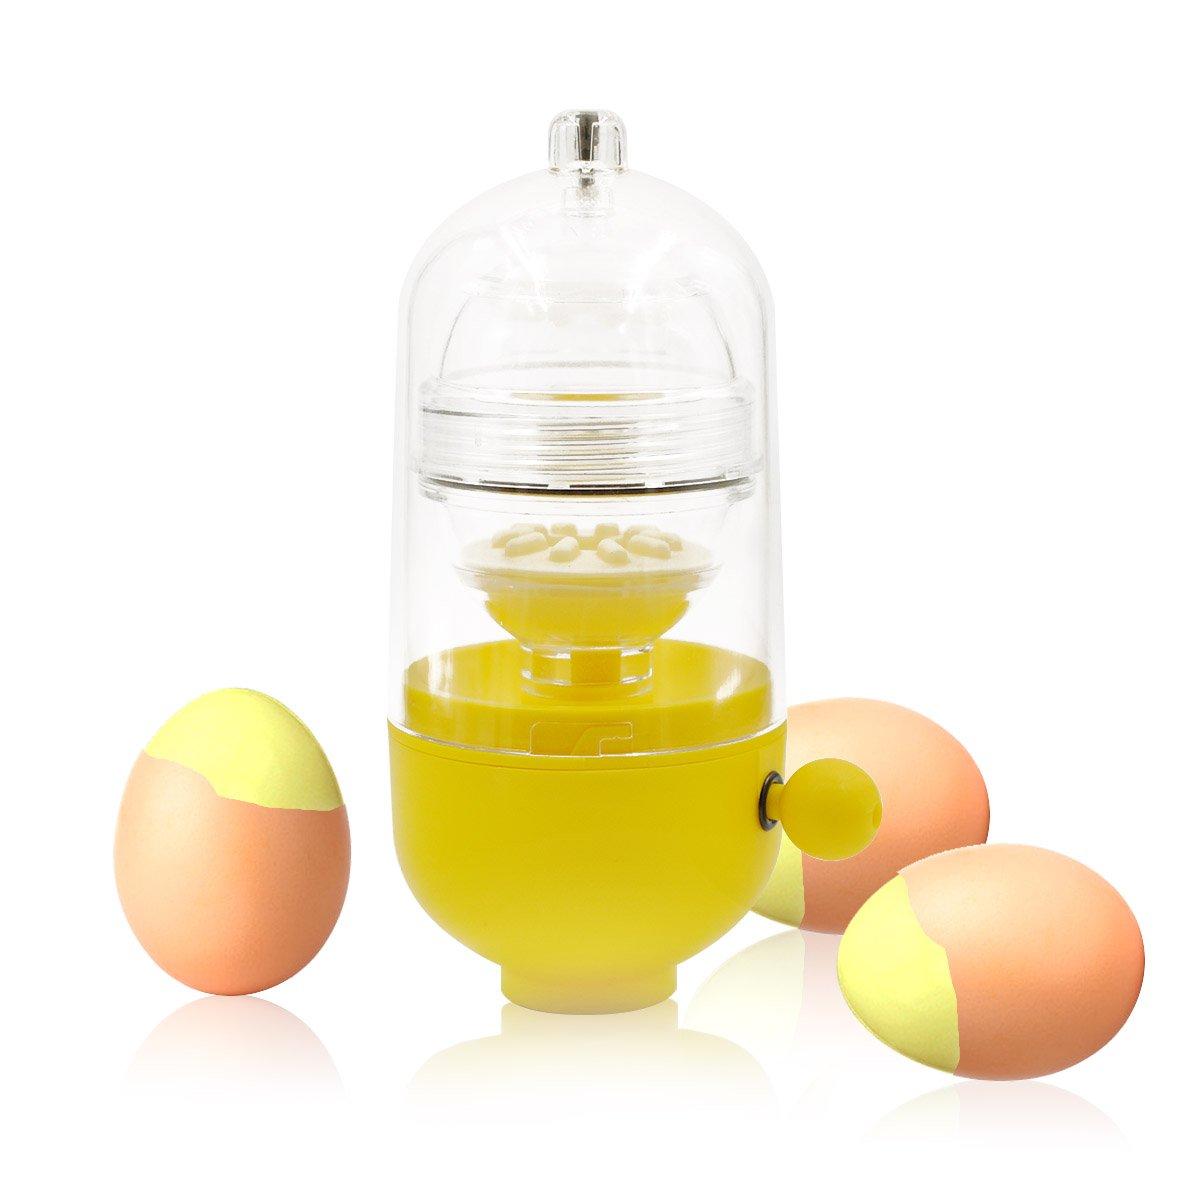 PROKITCHEN Hand Powered Golden Egg Scrambler Shaker Amazing Beater Maker for Mixing Yolk and White Inside Egg Shell, Yellow